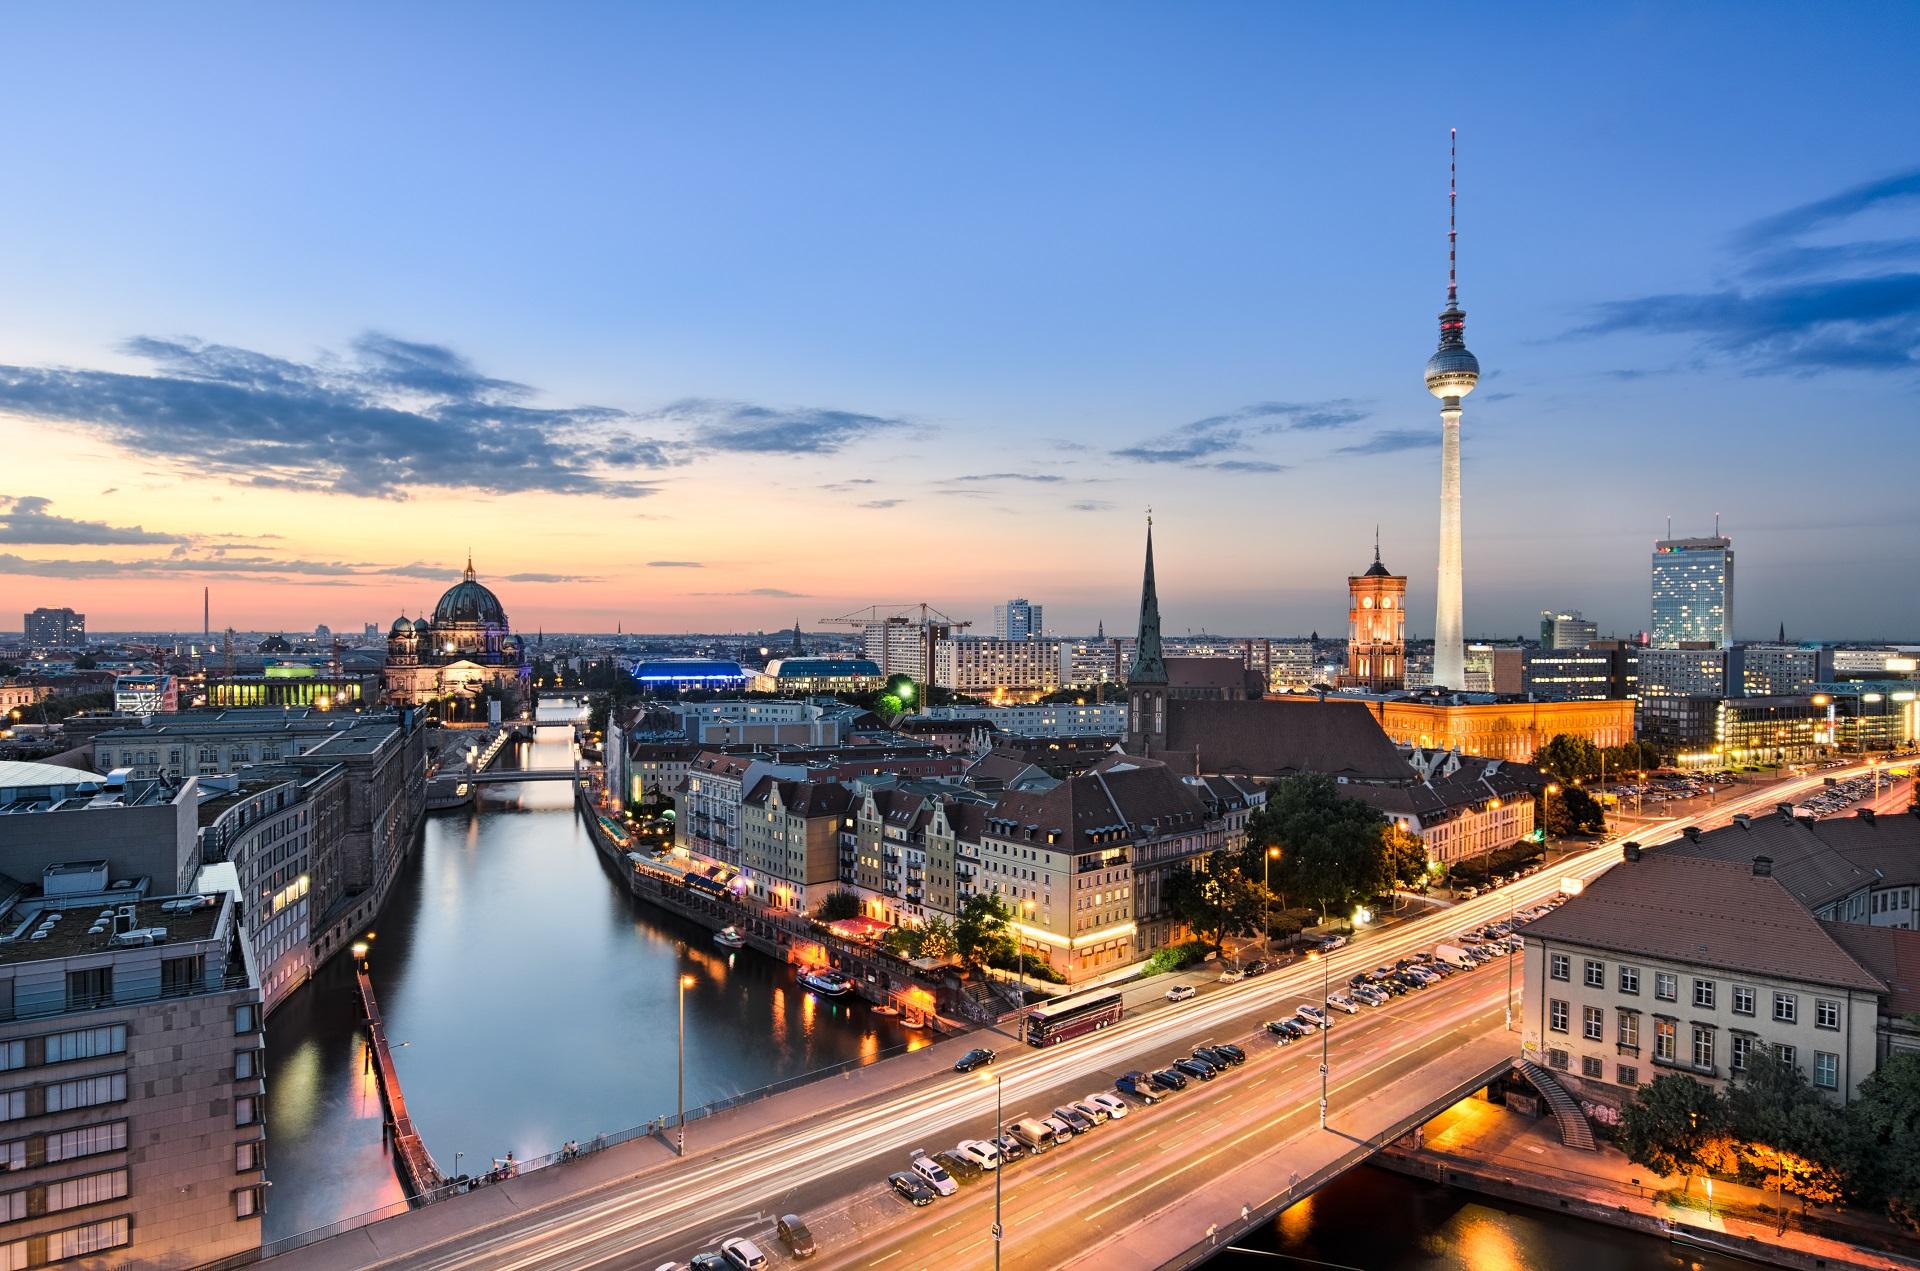 watado.de  Übernachtung in Berlin inkl. Wellness und SPA im 4 Sterne Hotel in Berlin ab 34,50€ p.P